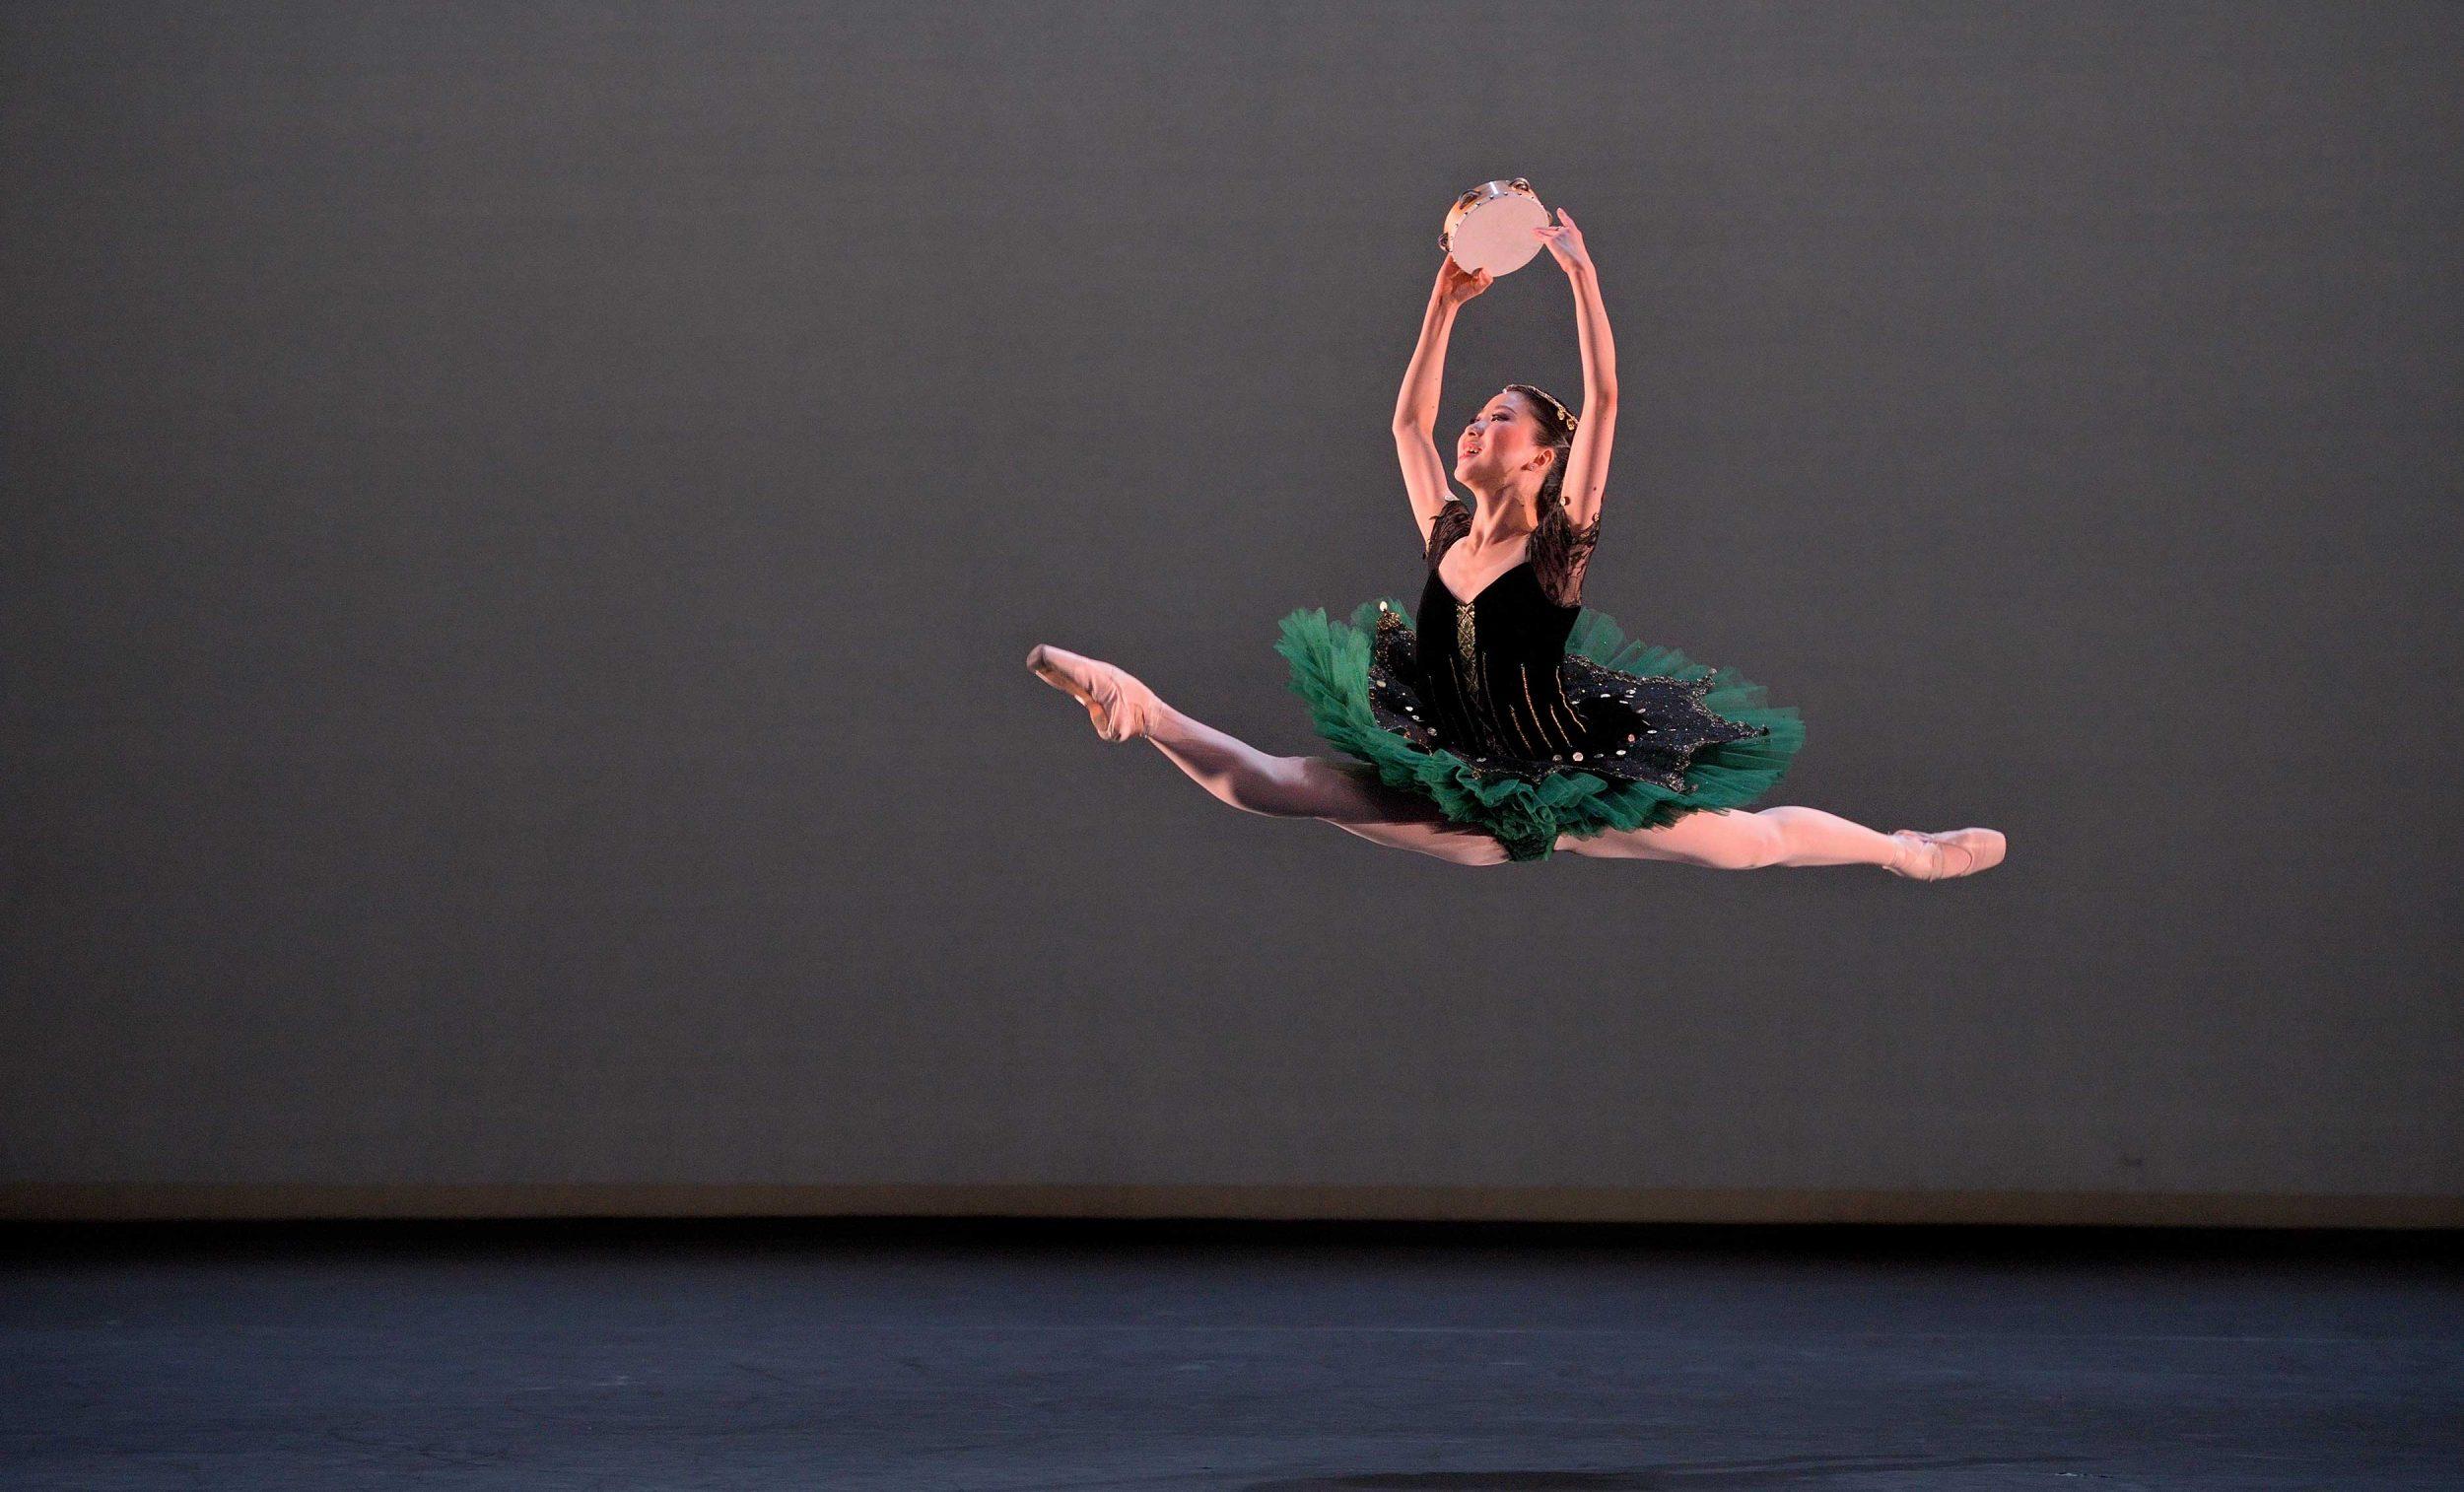 Rina-Kanehara-performing-the-Esmeralda-pas-de-deux-(c)-Laurent-Liotardo